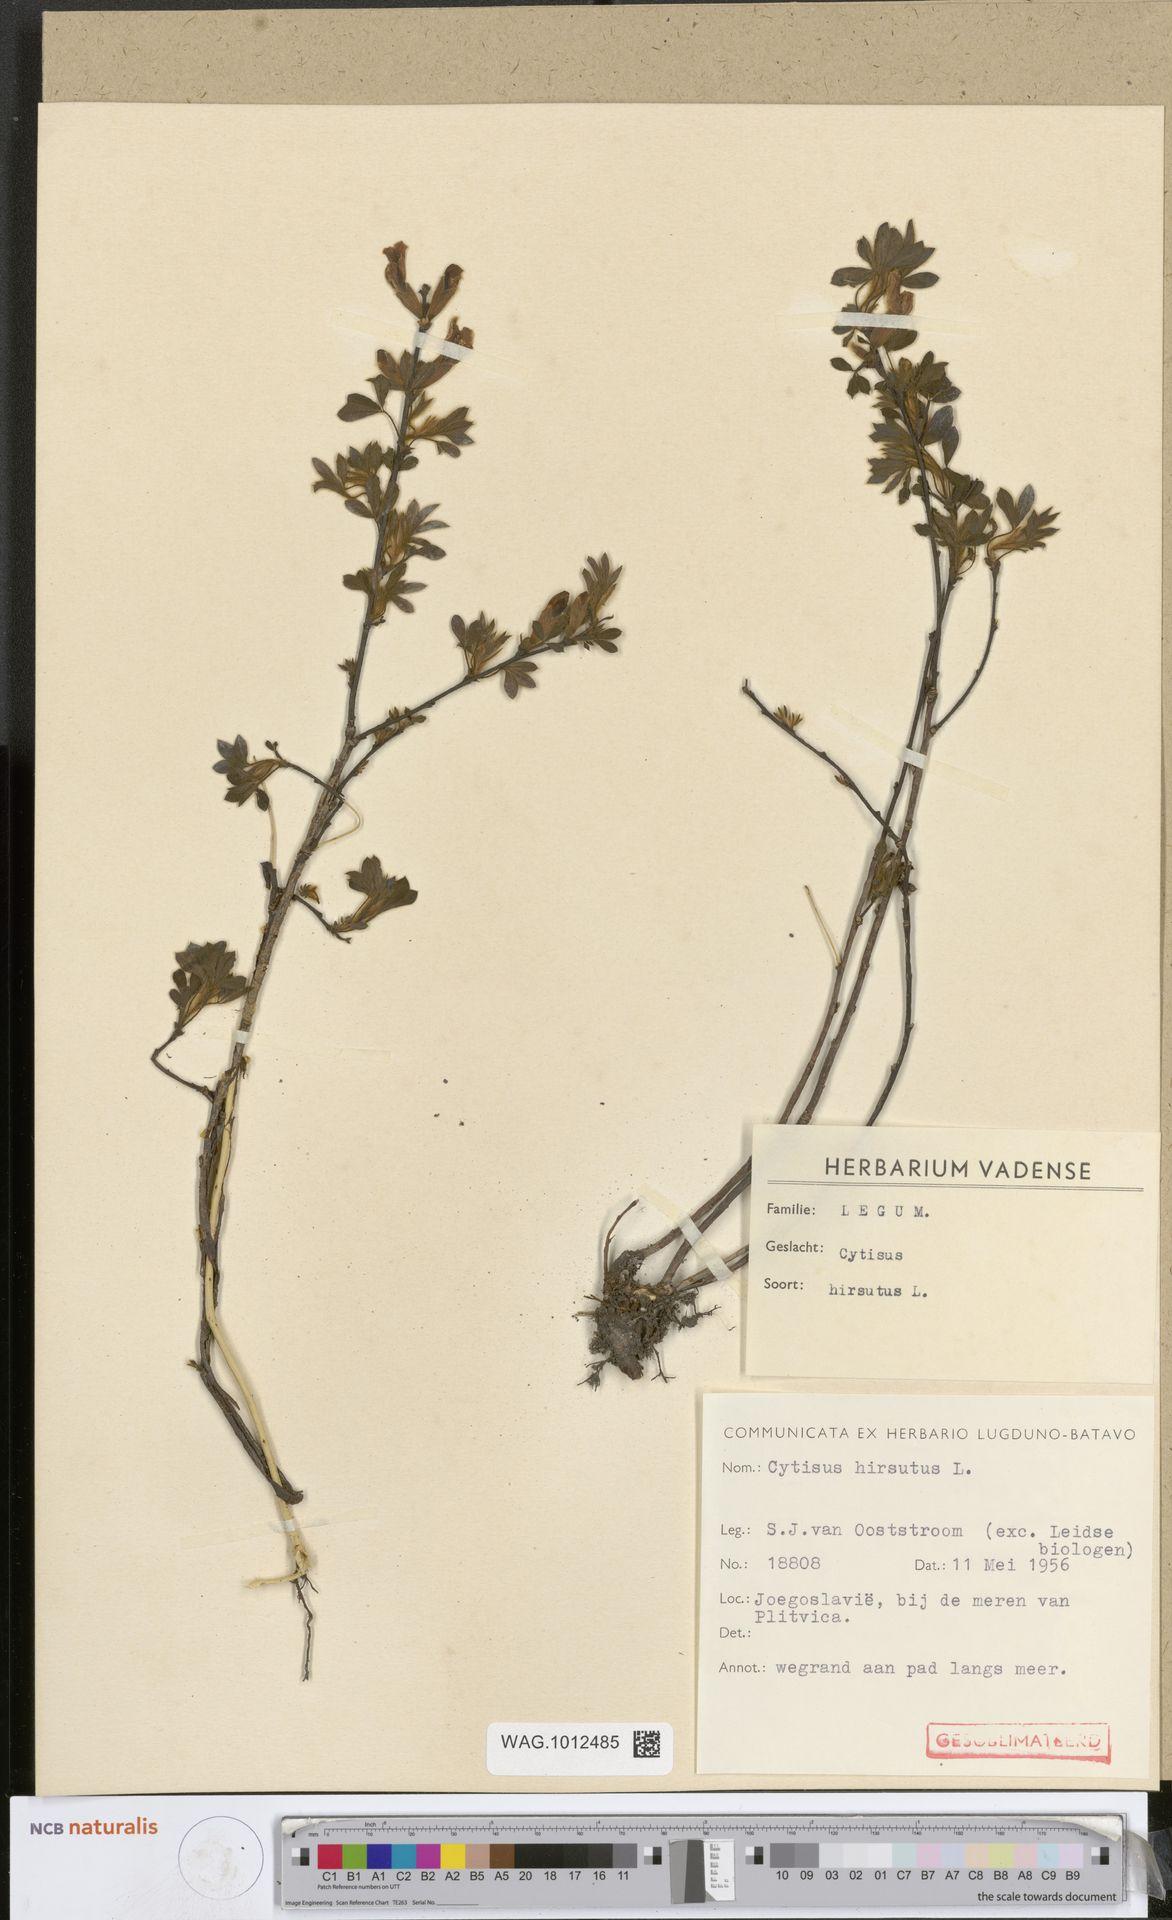 WAG.1012485 | Cytisus hirsutus L.